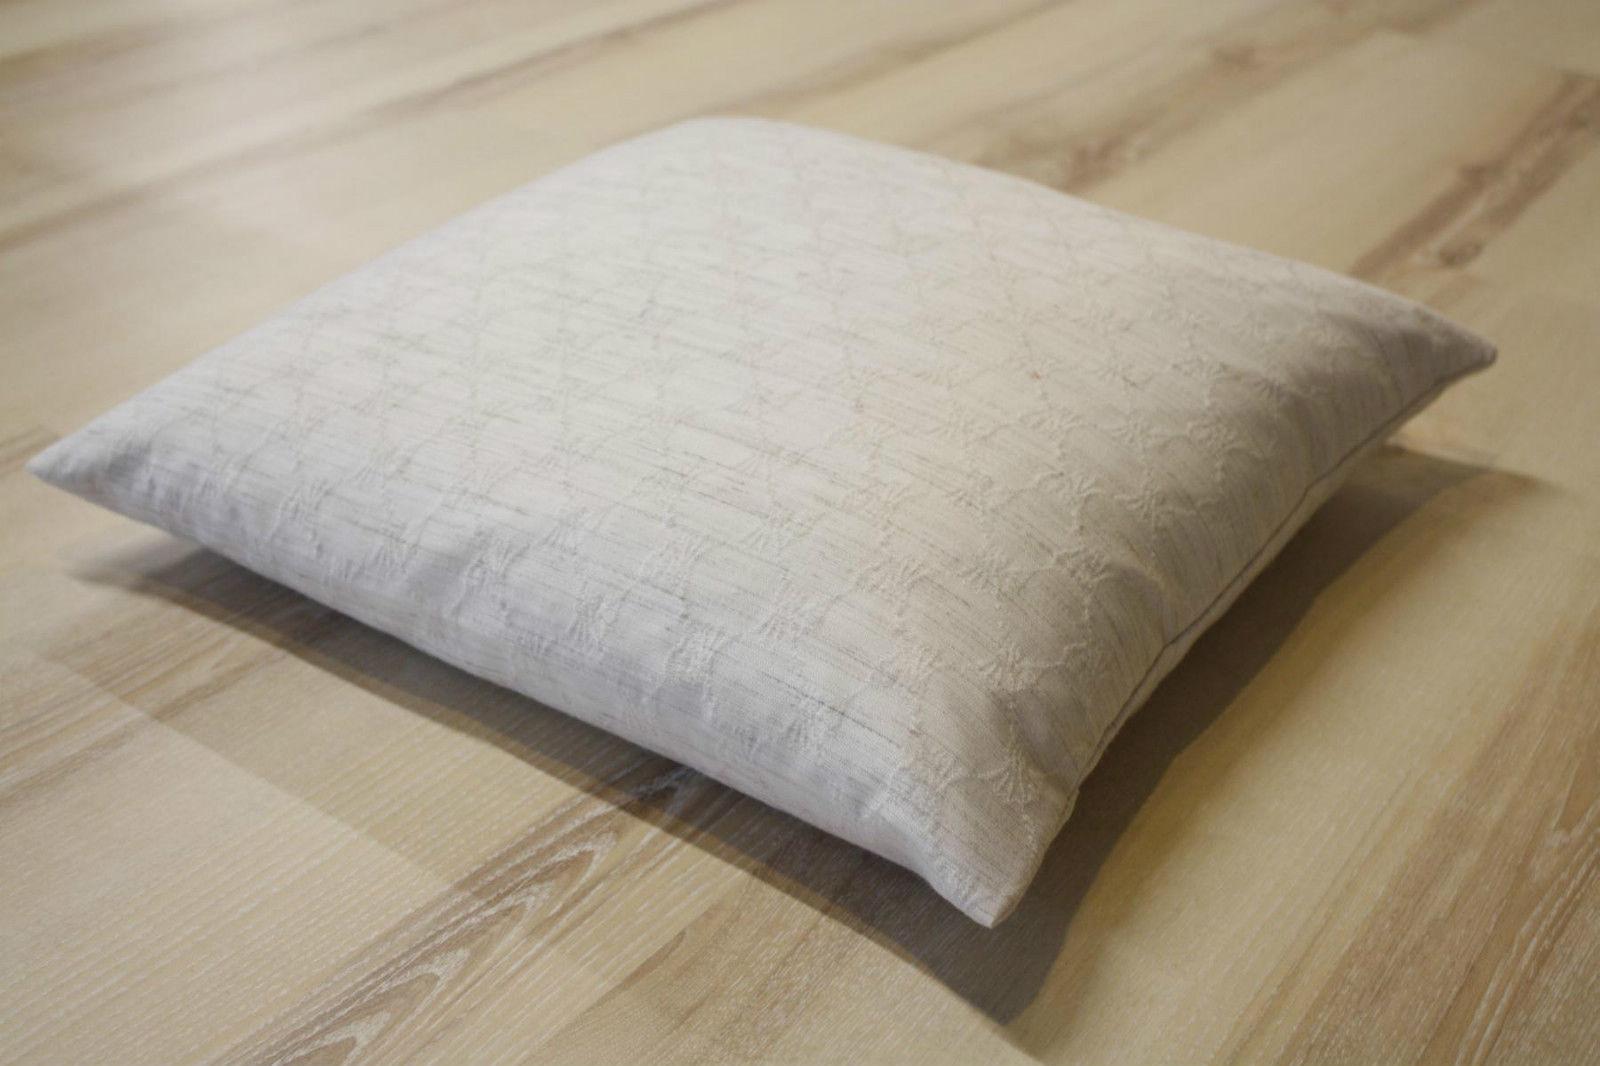 joop kissen uni doubleface pergament sand 50x50cm inkl federf llung neu ebay. Black Bedroom Furniture Sets. Home Design Ideas